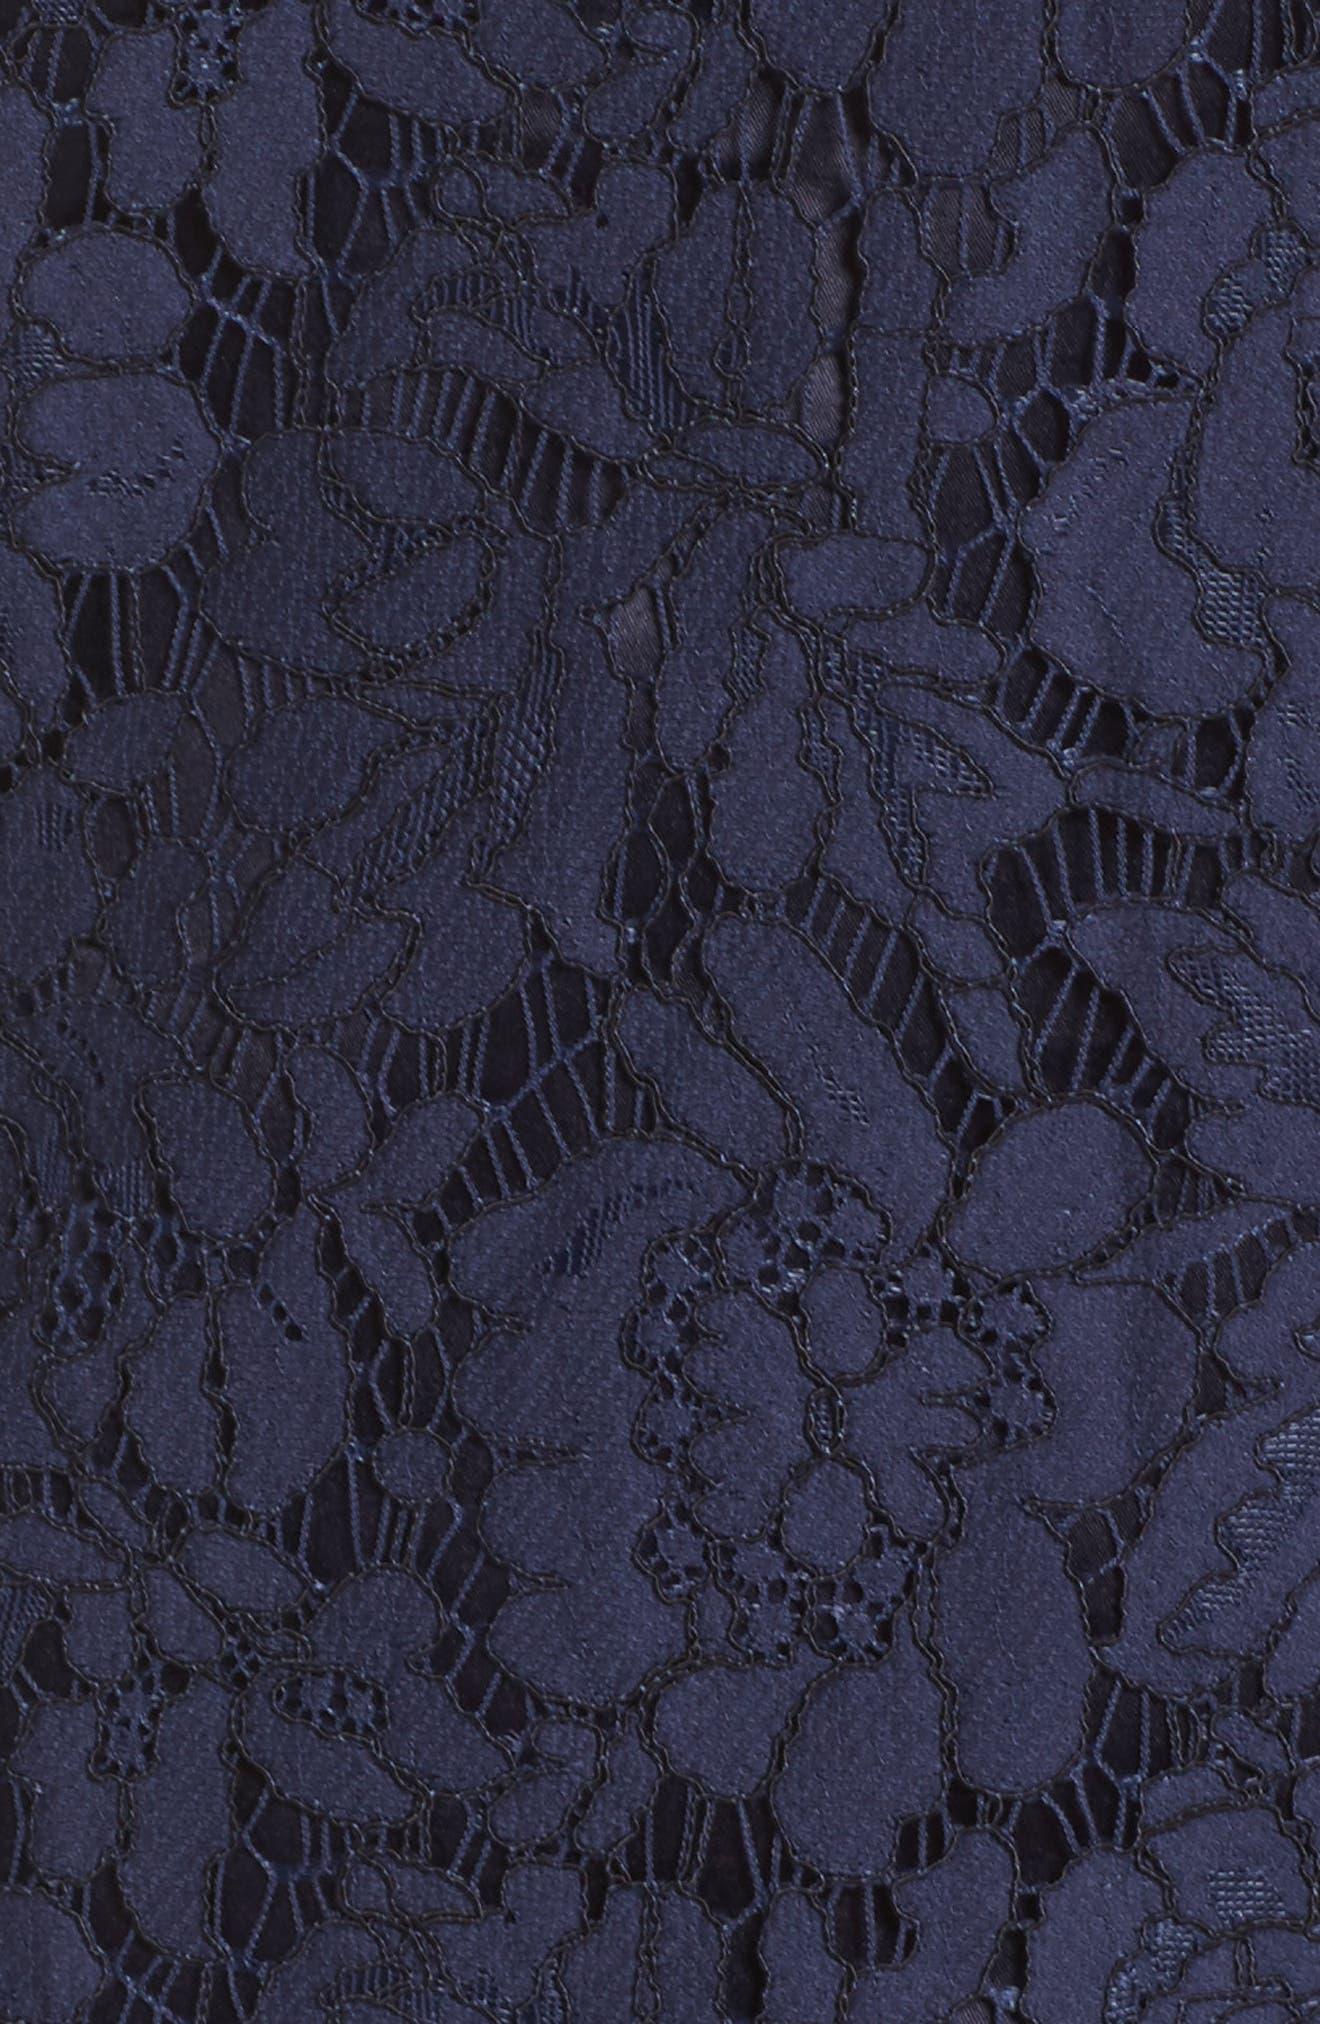 Ruffle Lace Shift Dress,                             Alternate thumbnail 5, color,                             Navy